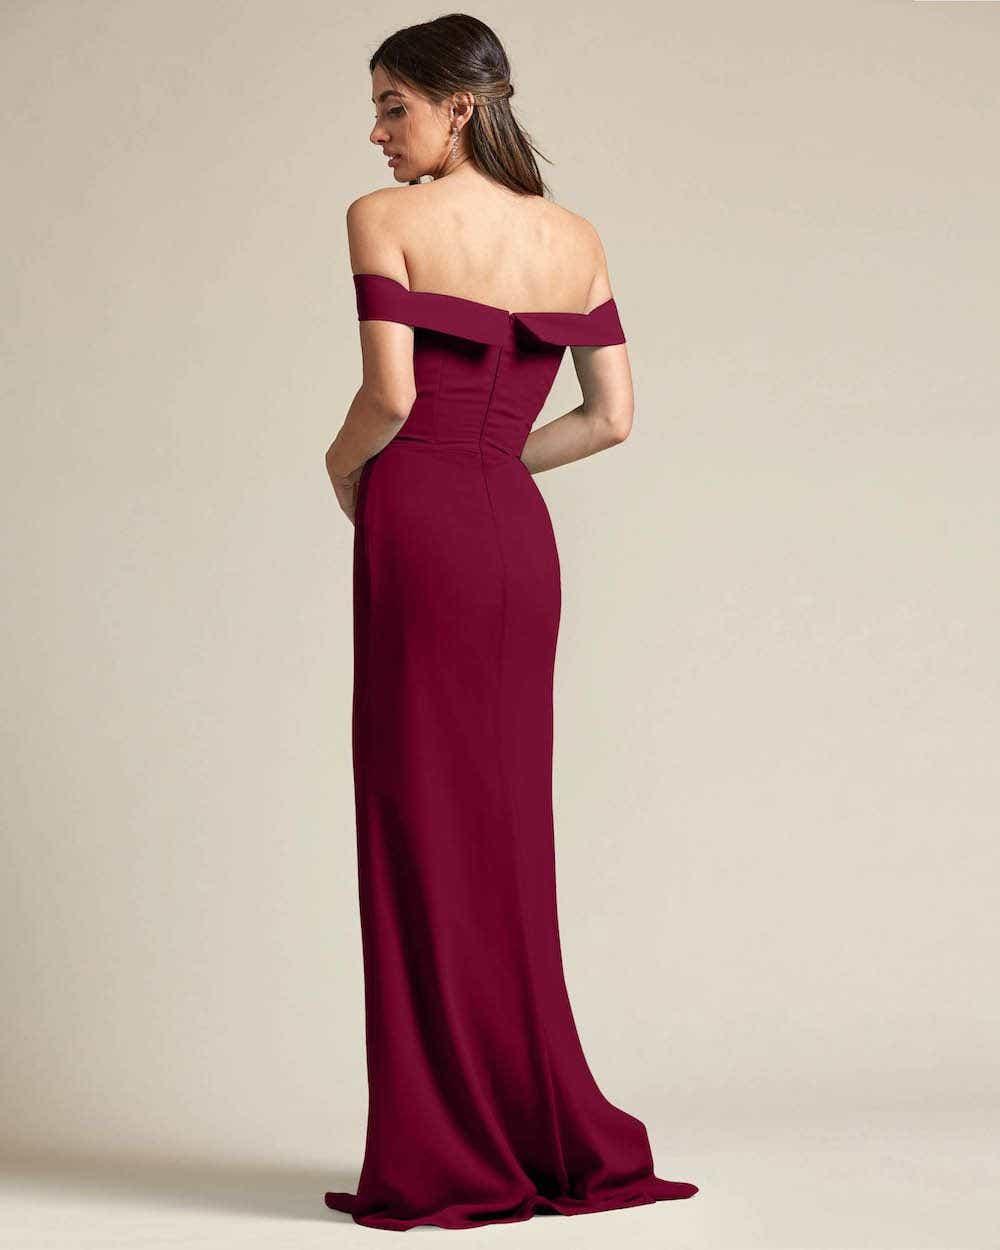 Over The Shoulder Classic Princess Maxi Dress - Back